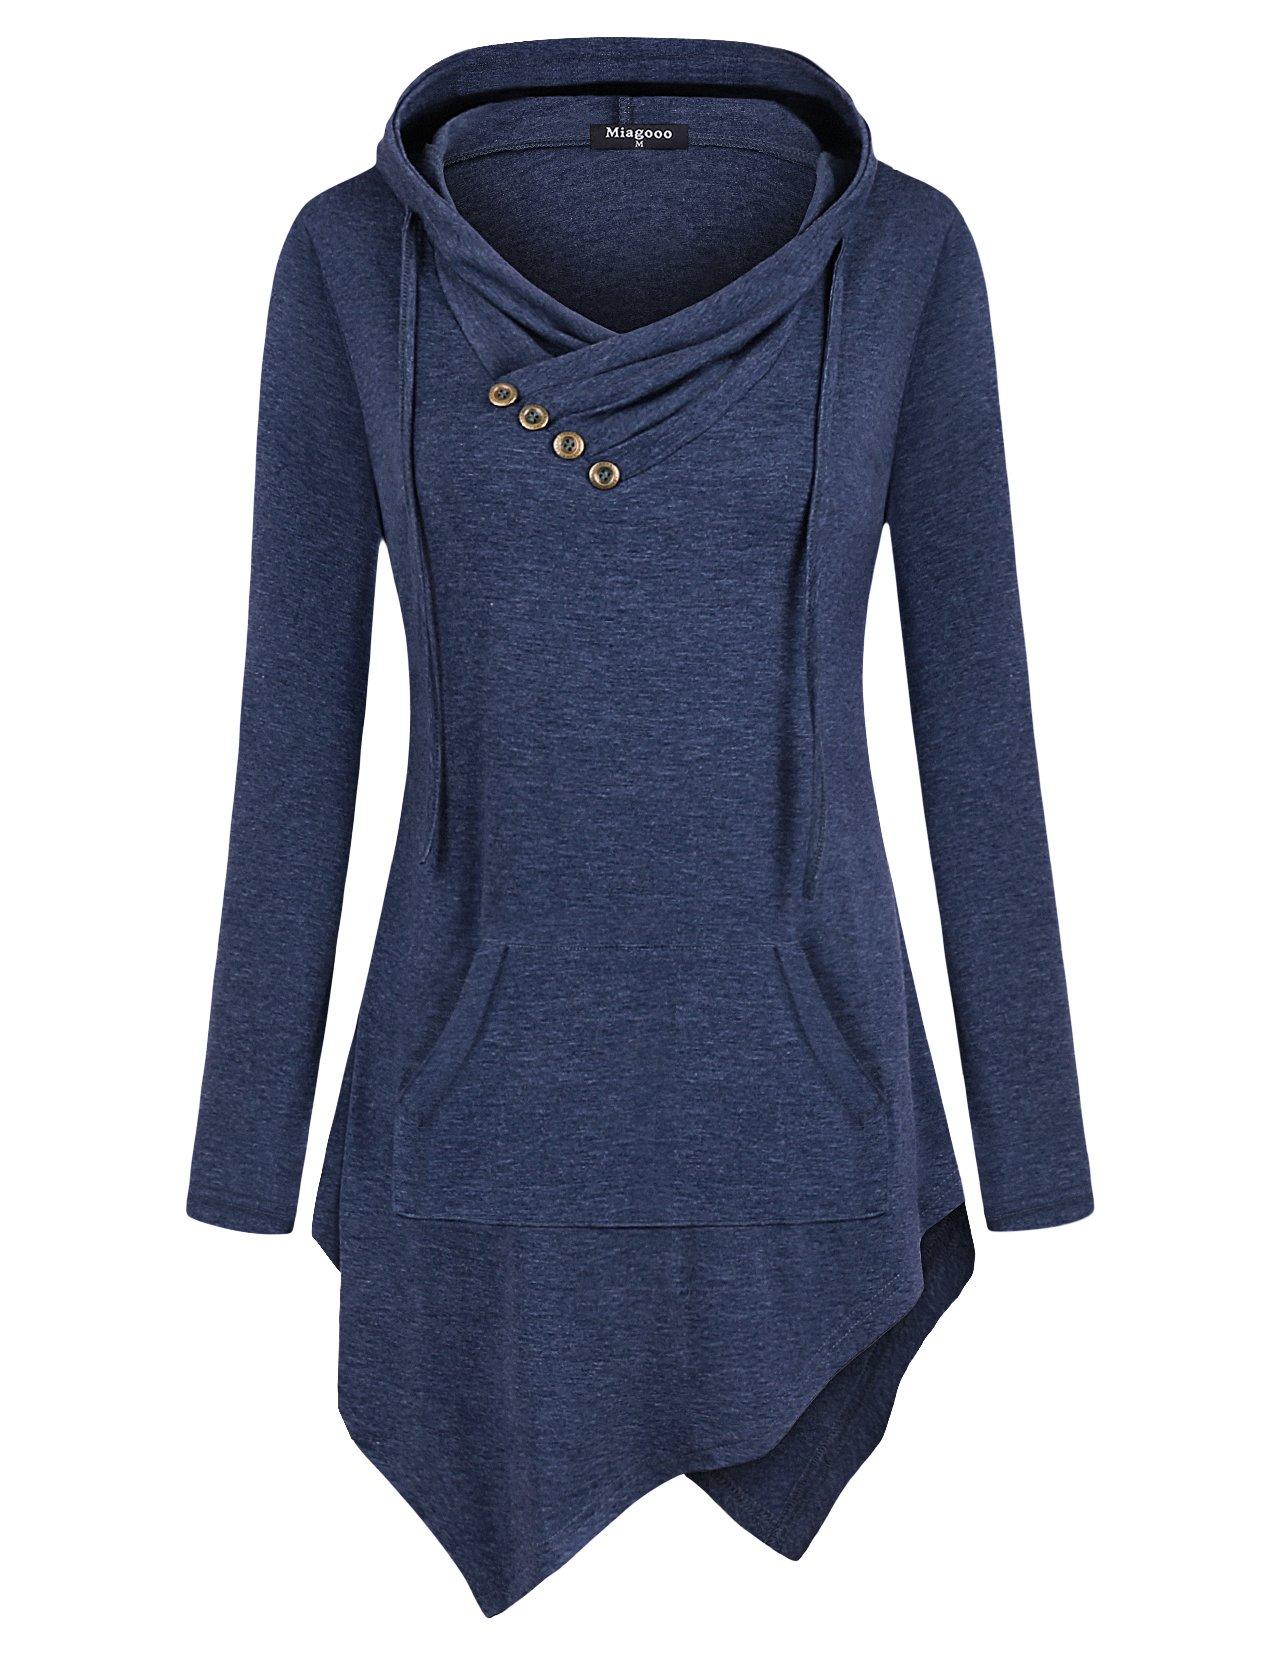 Miagooo Uneven Hemline Hoody Shirt Pocket Tunic Long Sleeve Casual Tops